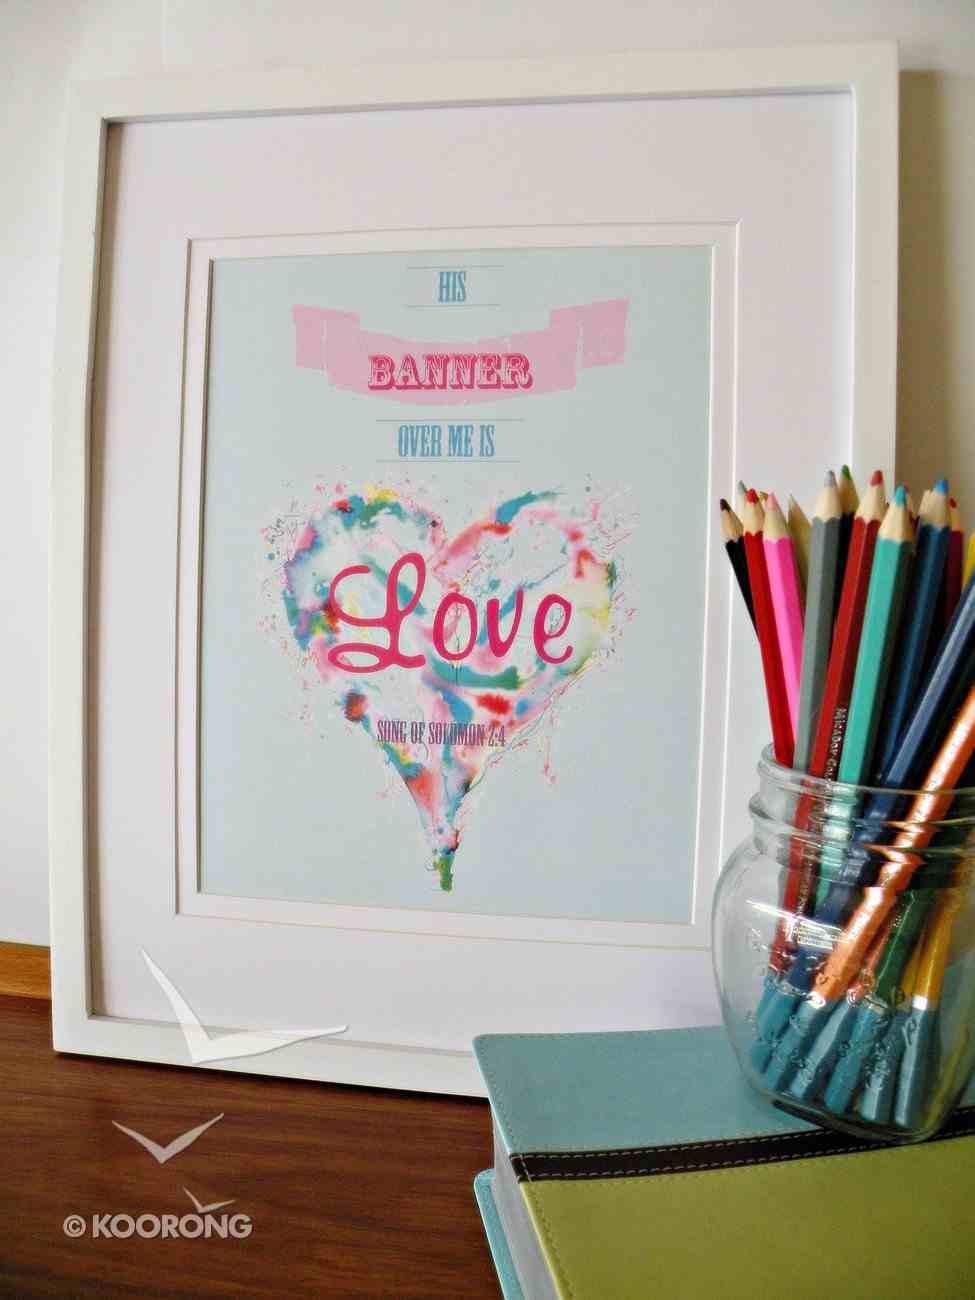 Medium Framed Print: Love Heart - His Banner Over Me is Love Song of Solomon 2:4 Plaque